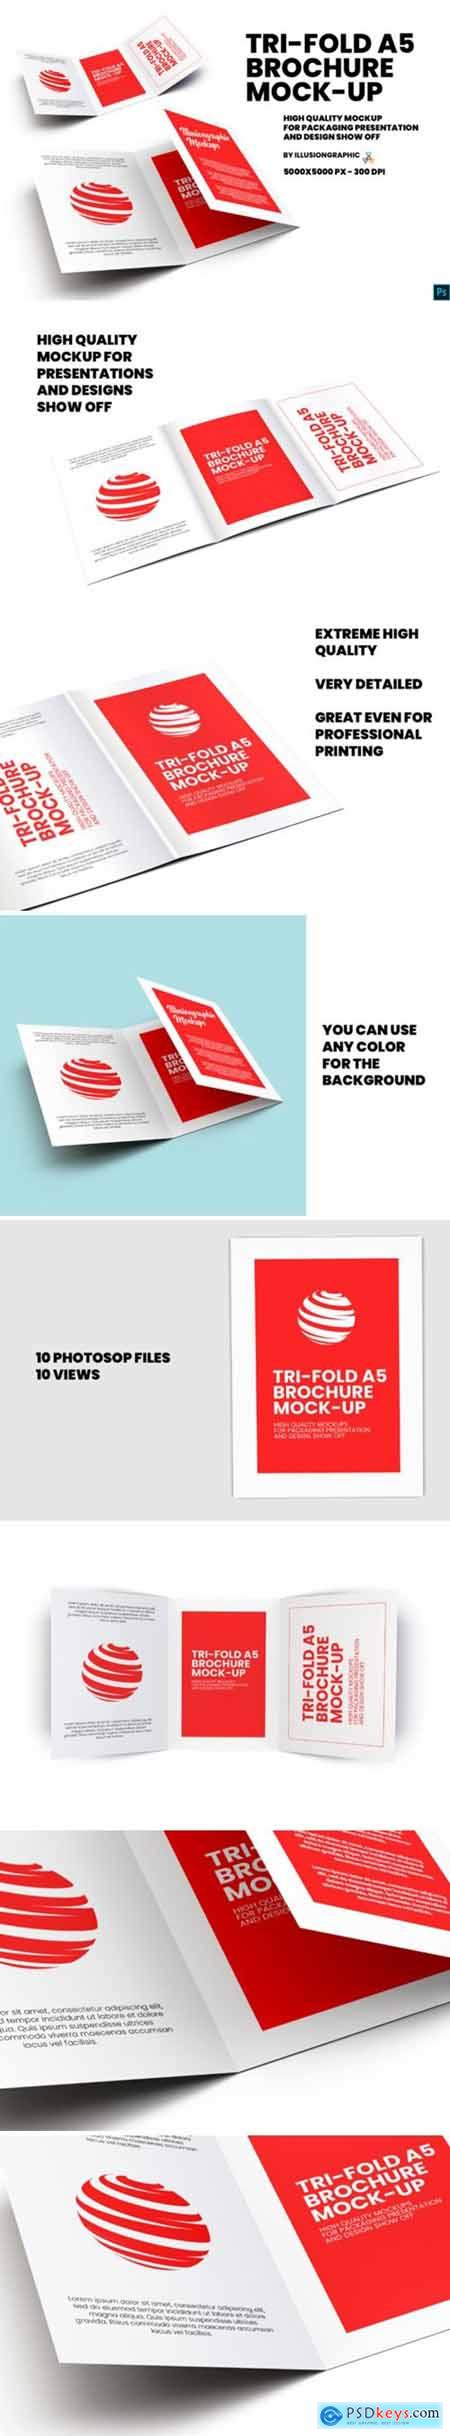 Tri-Fold A5 Brochure Mock-up 3913718